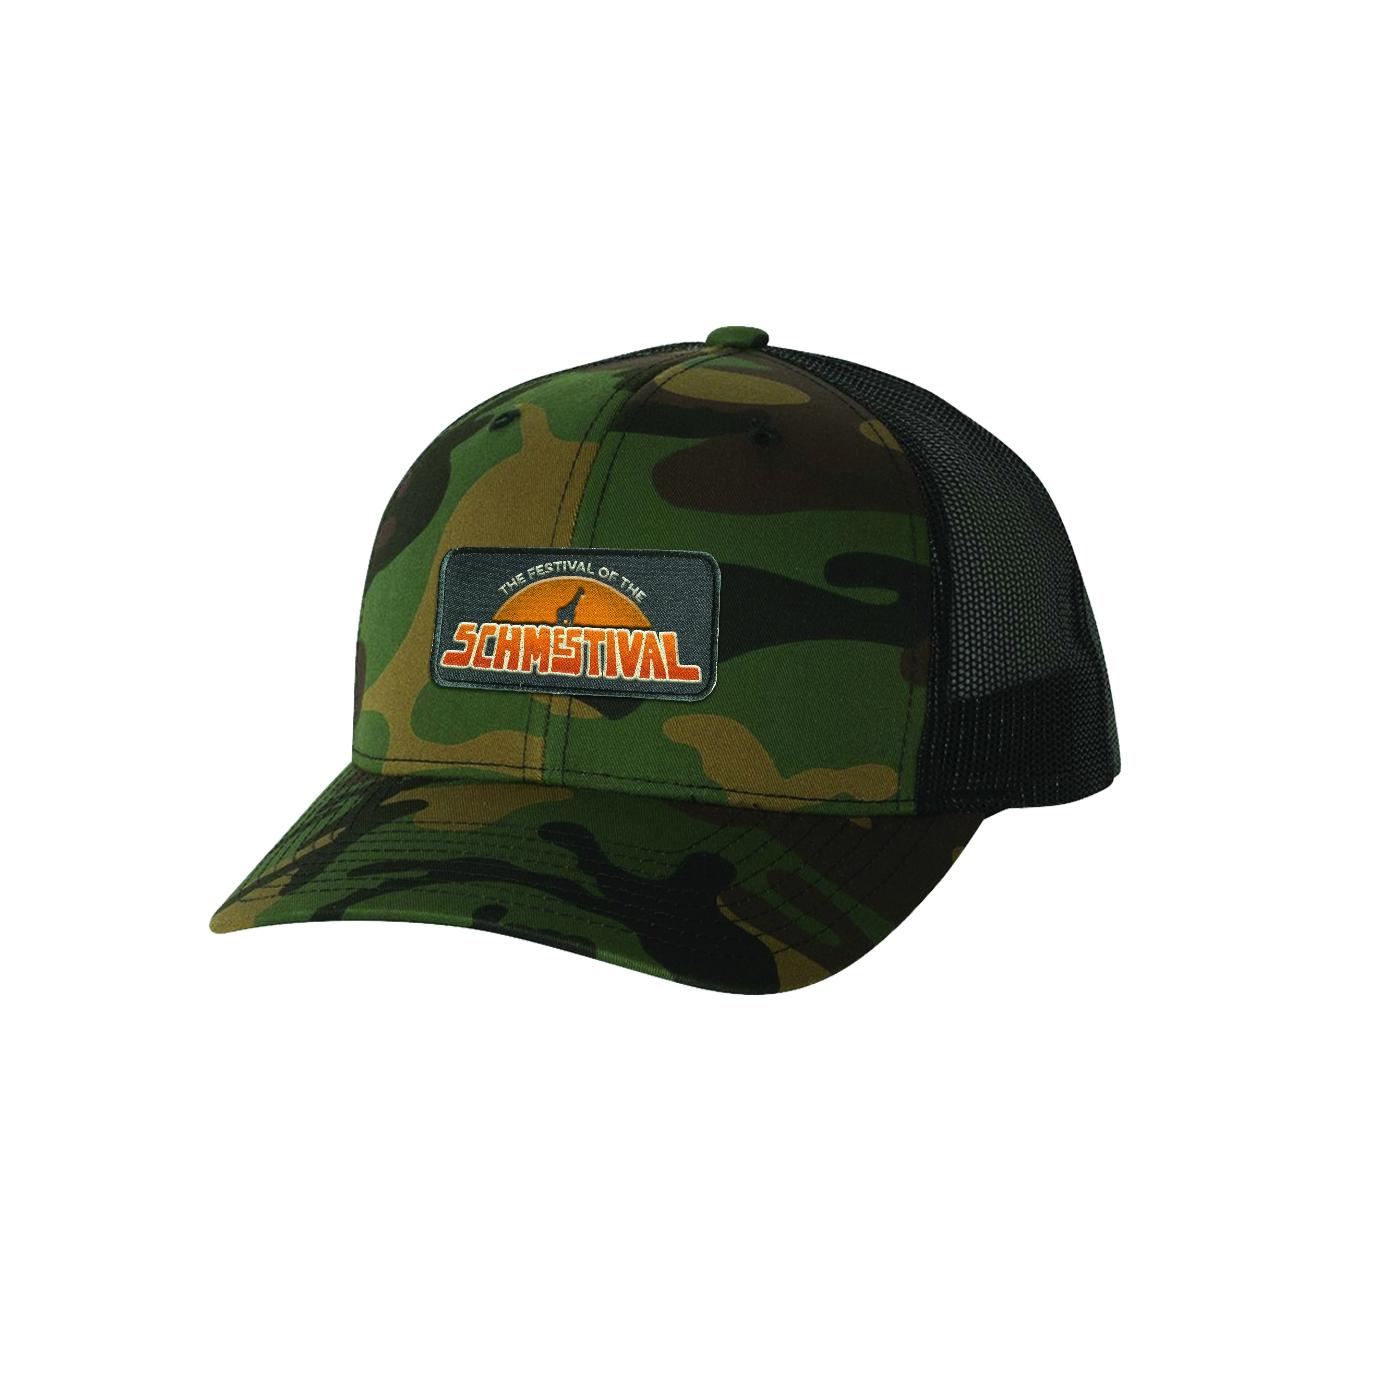 Schmestival Logo Trucker Hat Green Camo/Black